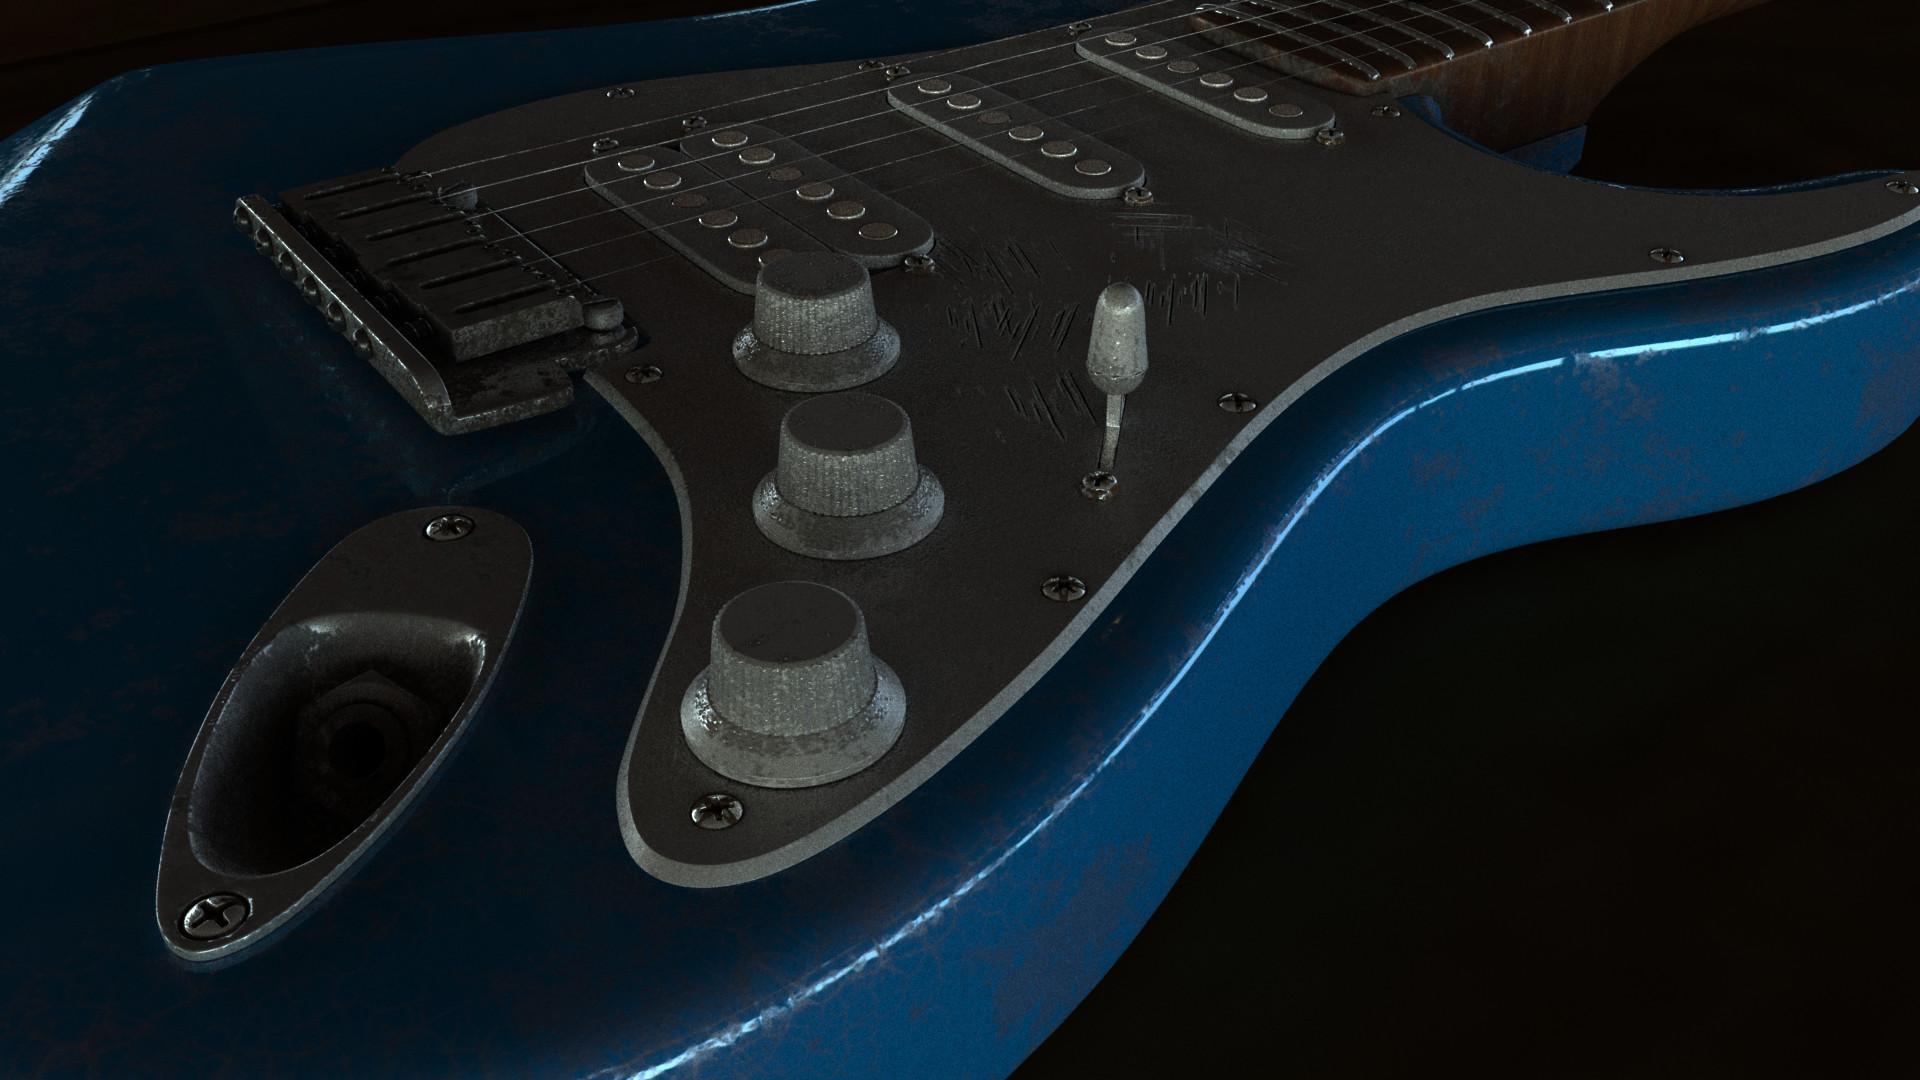 Sebastian gomez sebastians guitar renderman 0226 detail